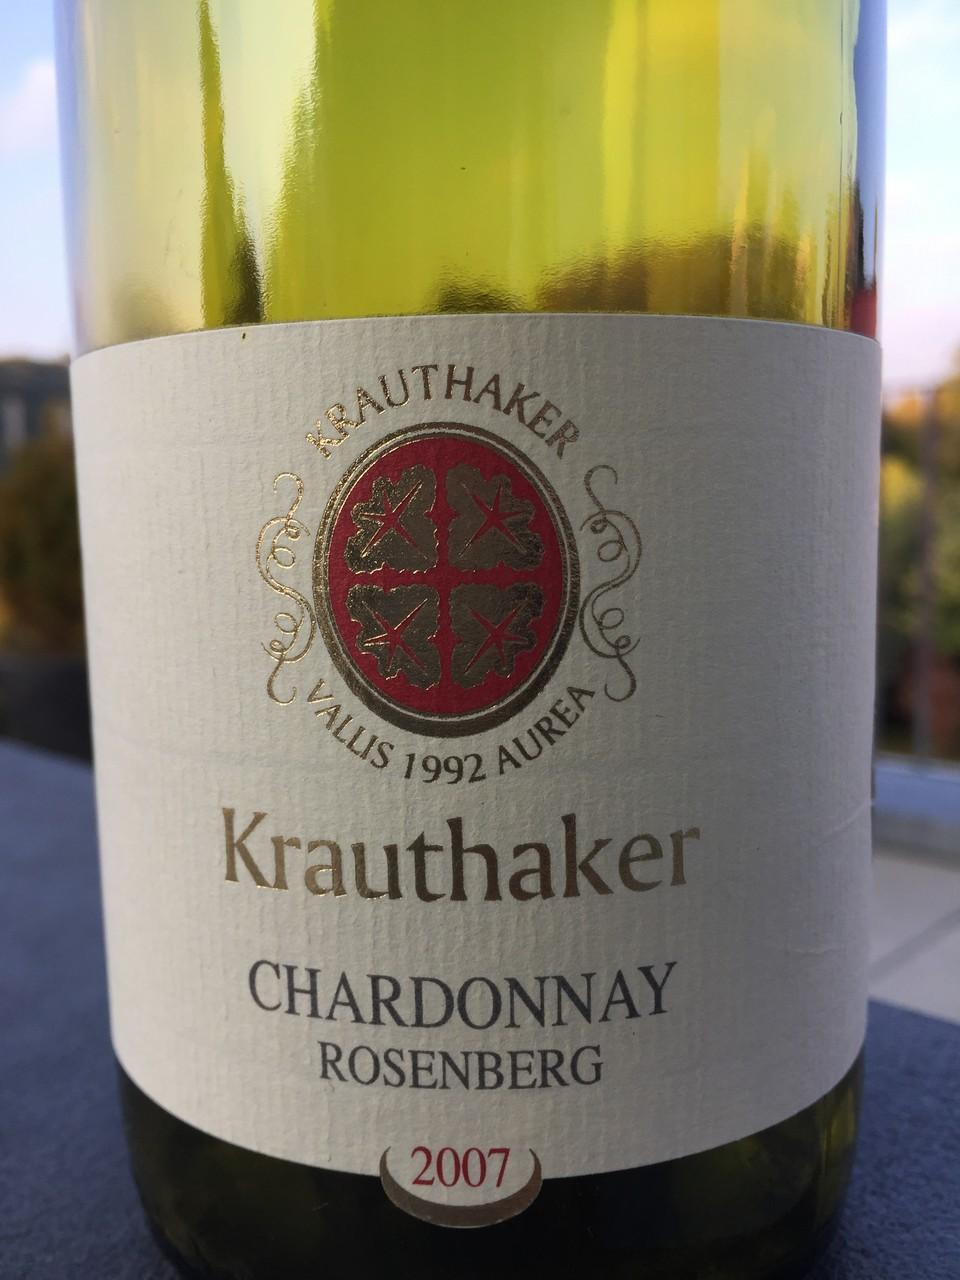 Chardonnay, Krauthaker, 2007